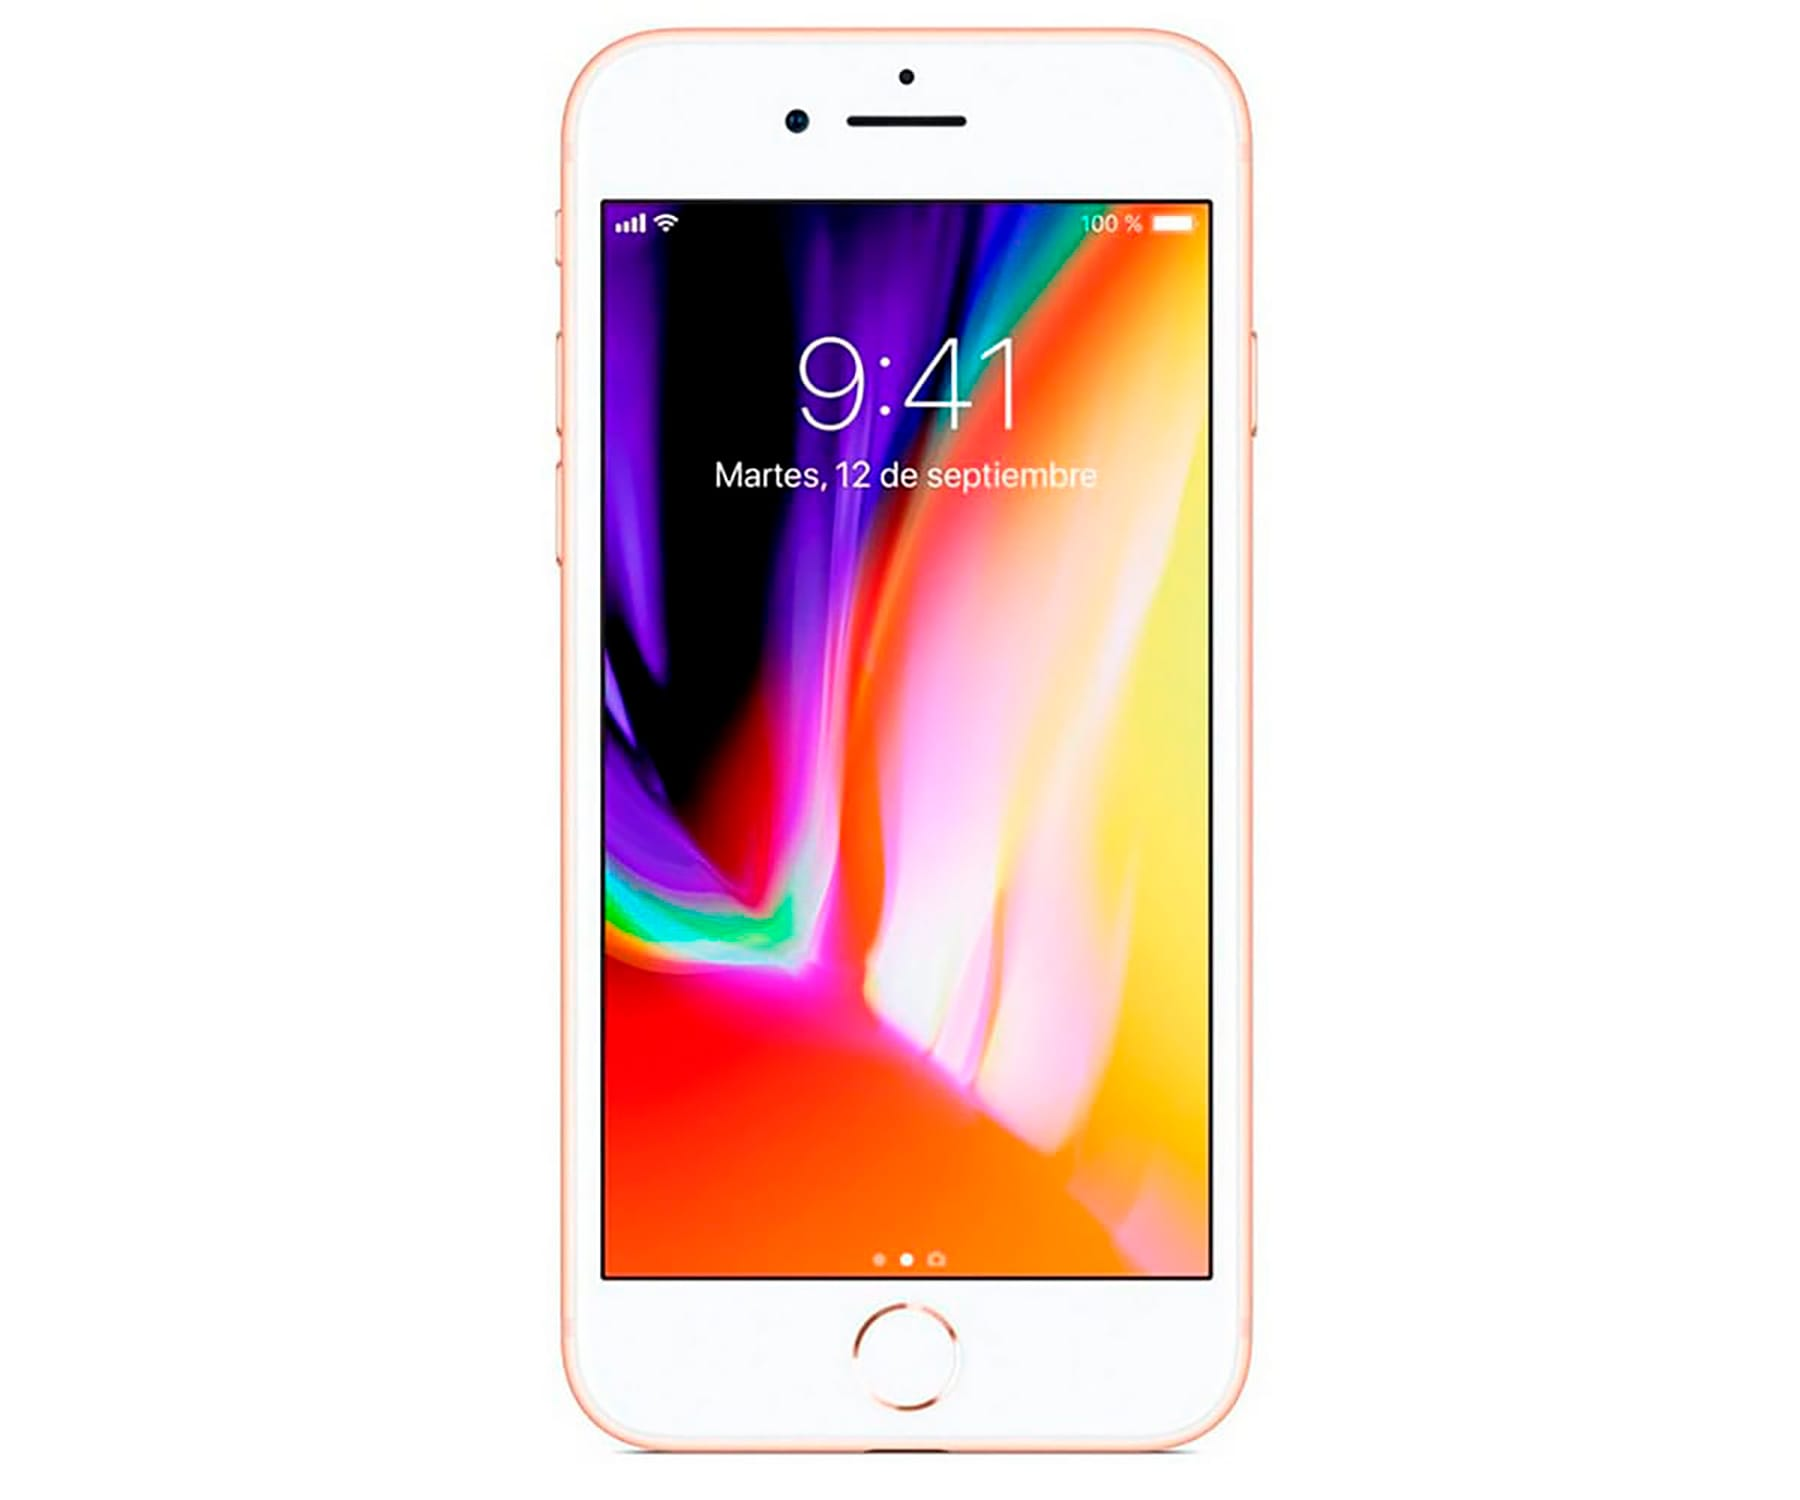 Apple Iphone 8 64gb Oro Reacondicionado Cpo Móvil 4g 4.7'' Retina Hd/6core/64gb/... (2)